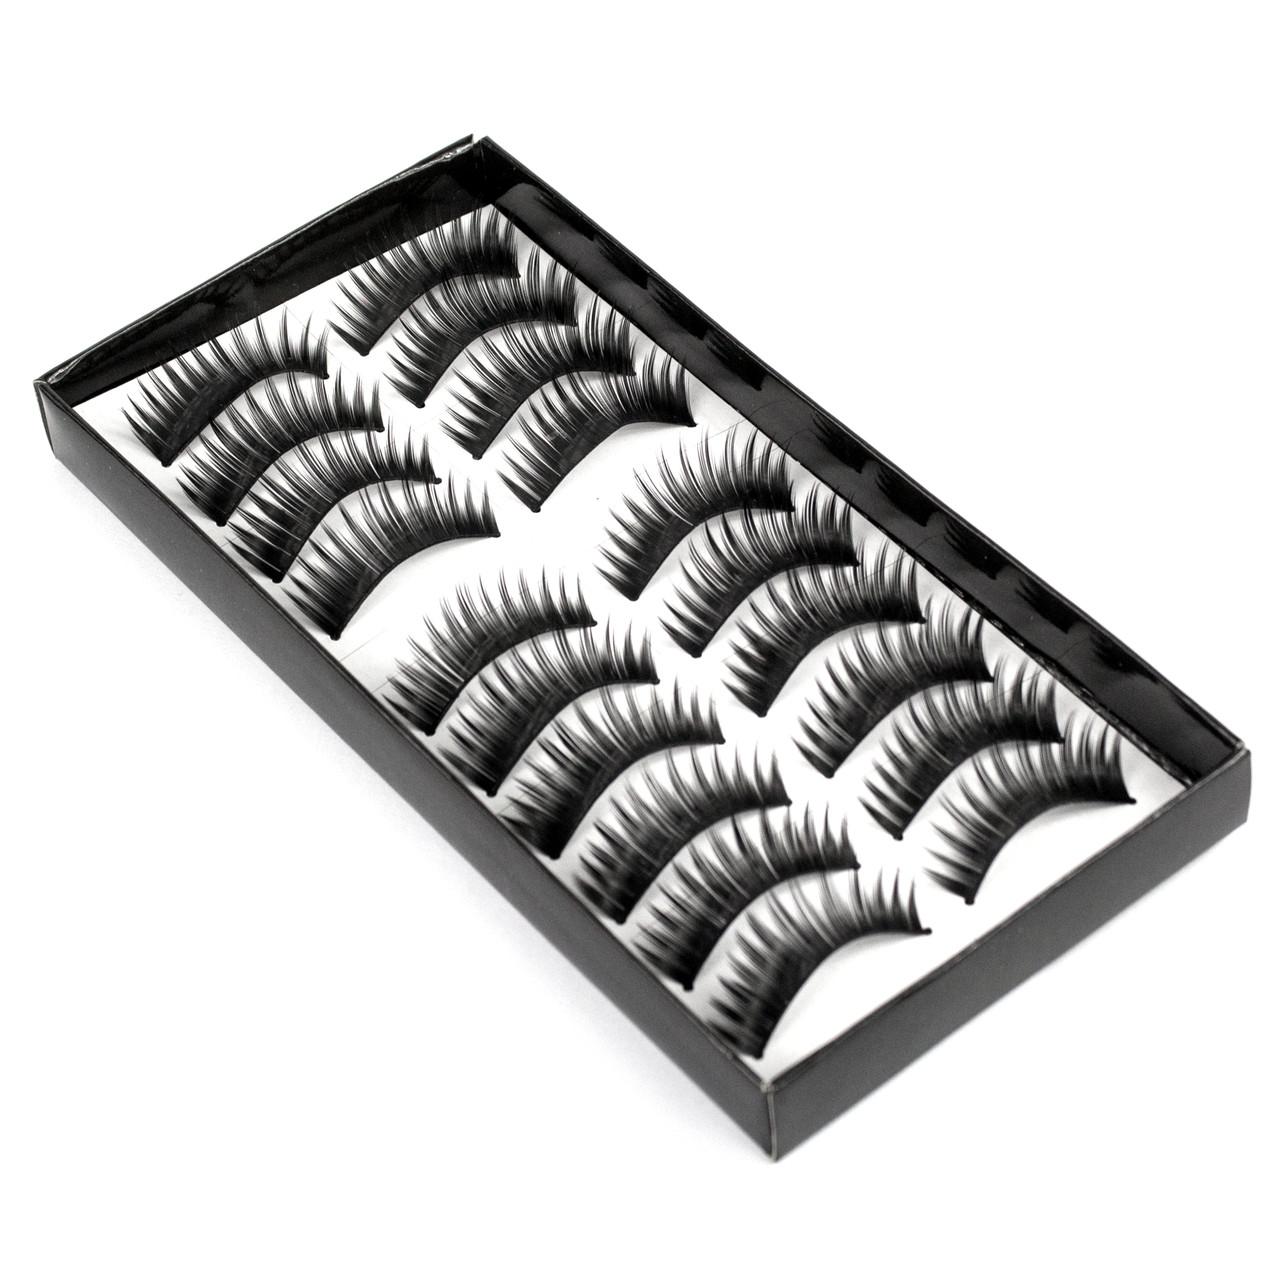 Накладные ресницы 10 пар Beauties Factory Good-to-go Eyelashes – BF-9